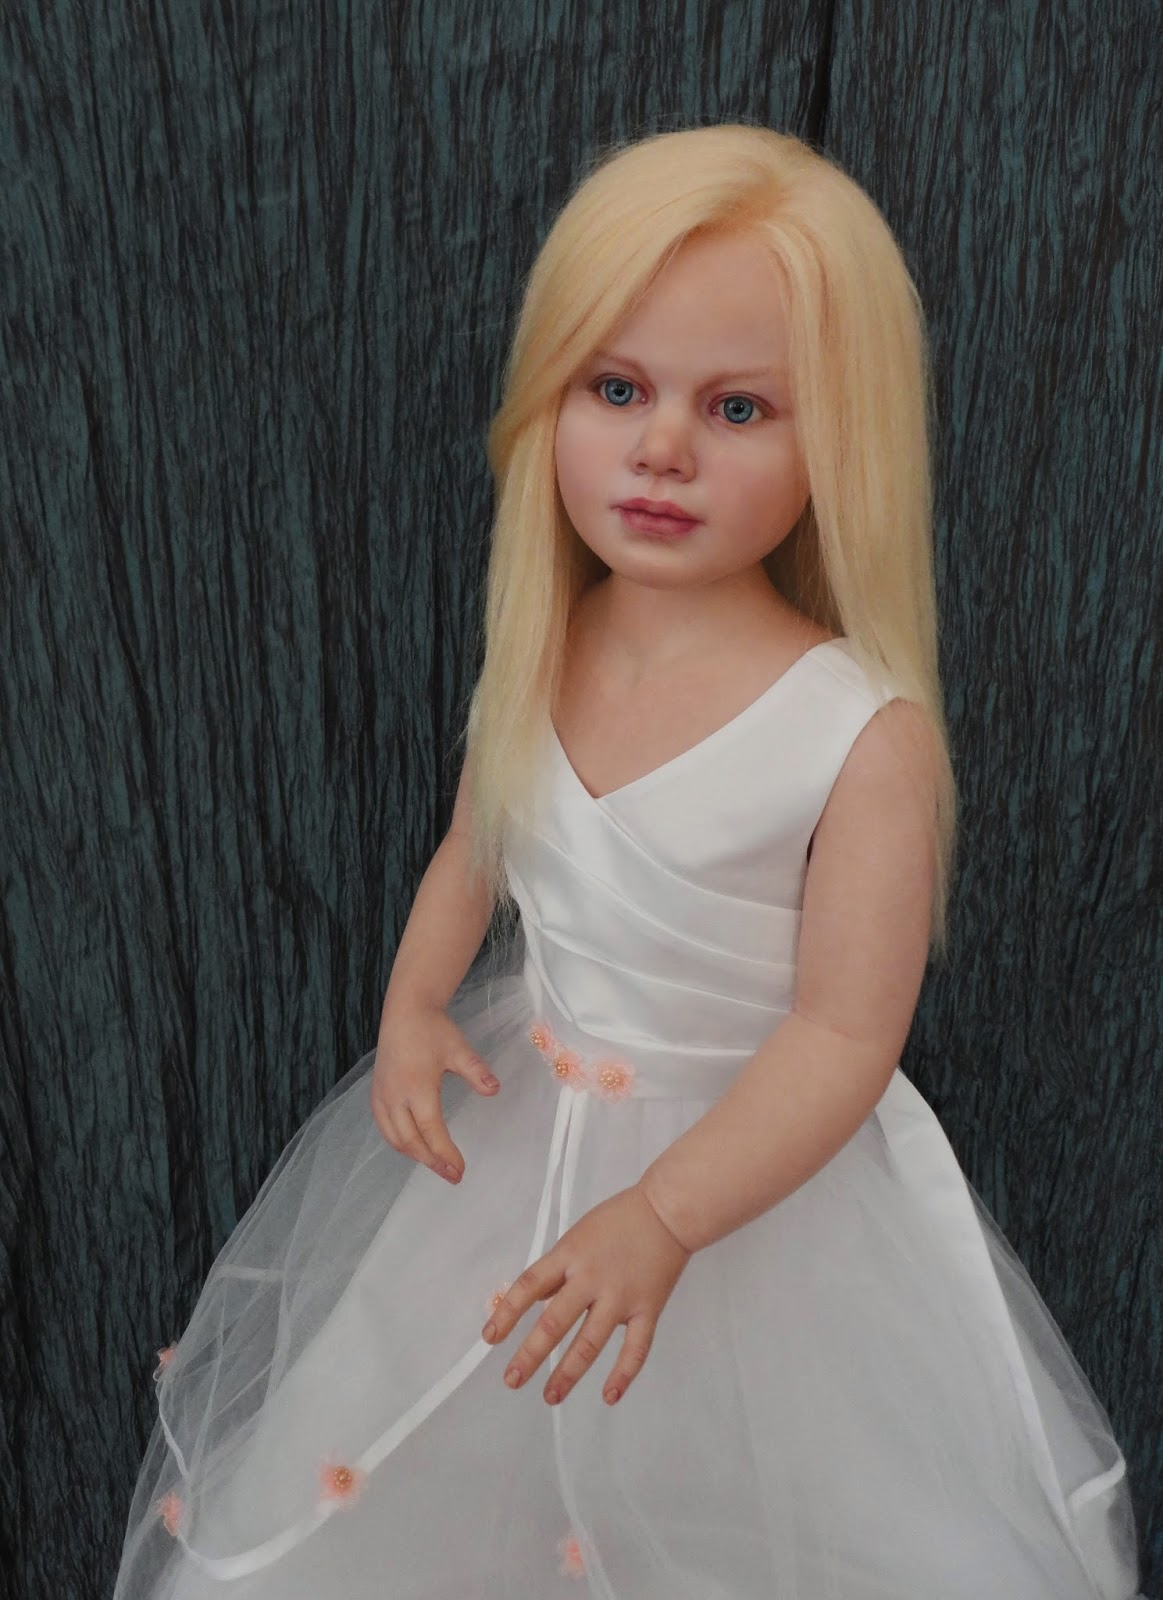 Anyas Originals Reborns And Ooak Art Dolls New  Gabriella  Lifesize Reborn Doll-1264